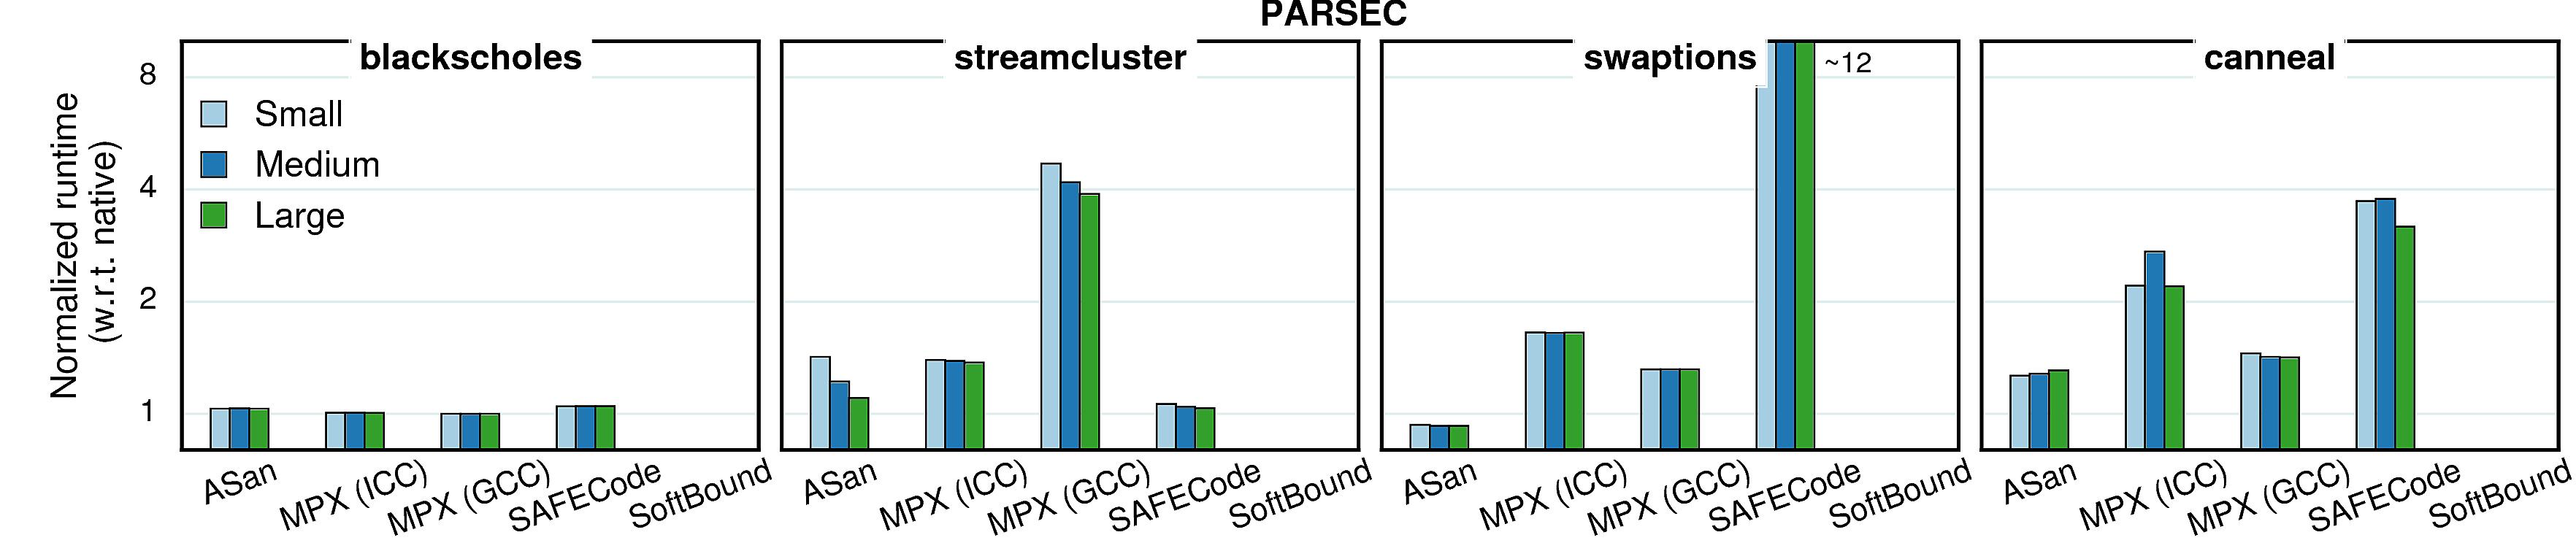 Varying inputs - performance (PARSEC)